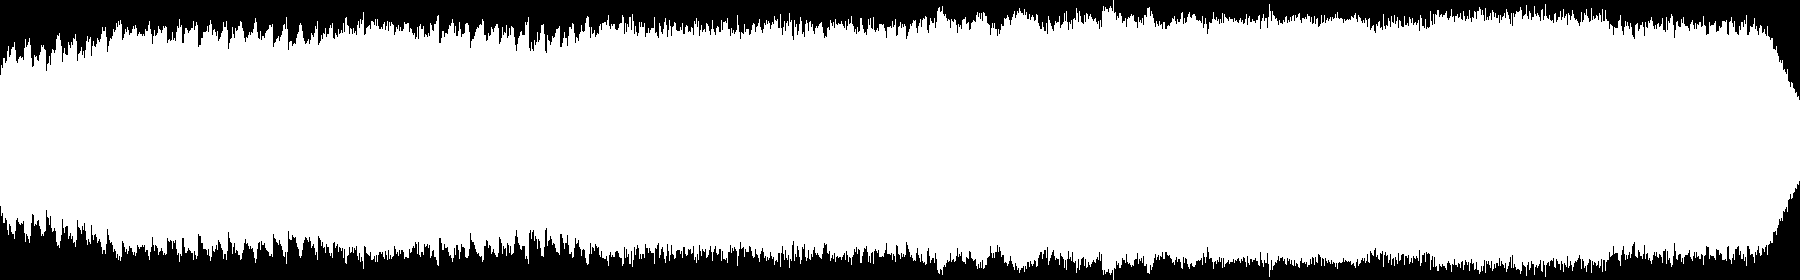 LO-FI Electronica audio waveform